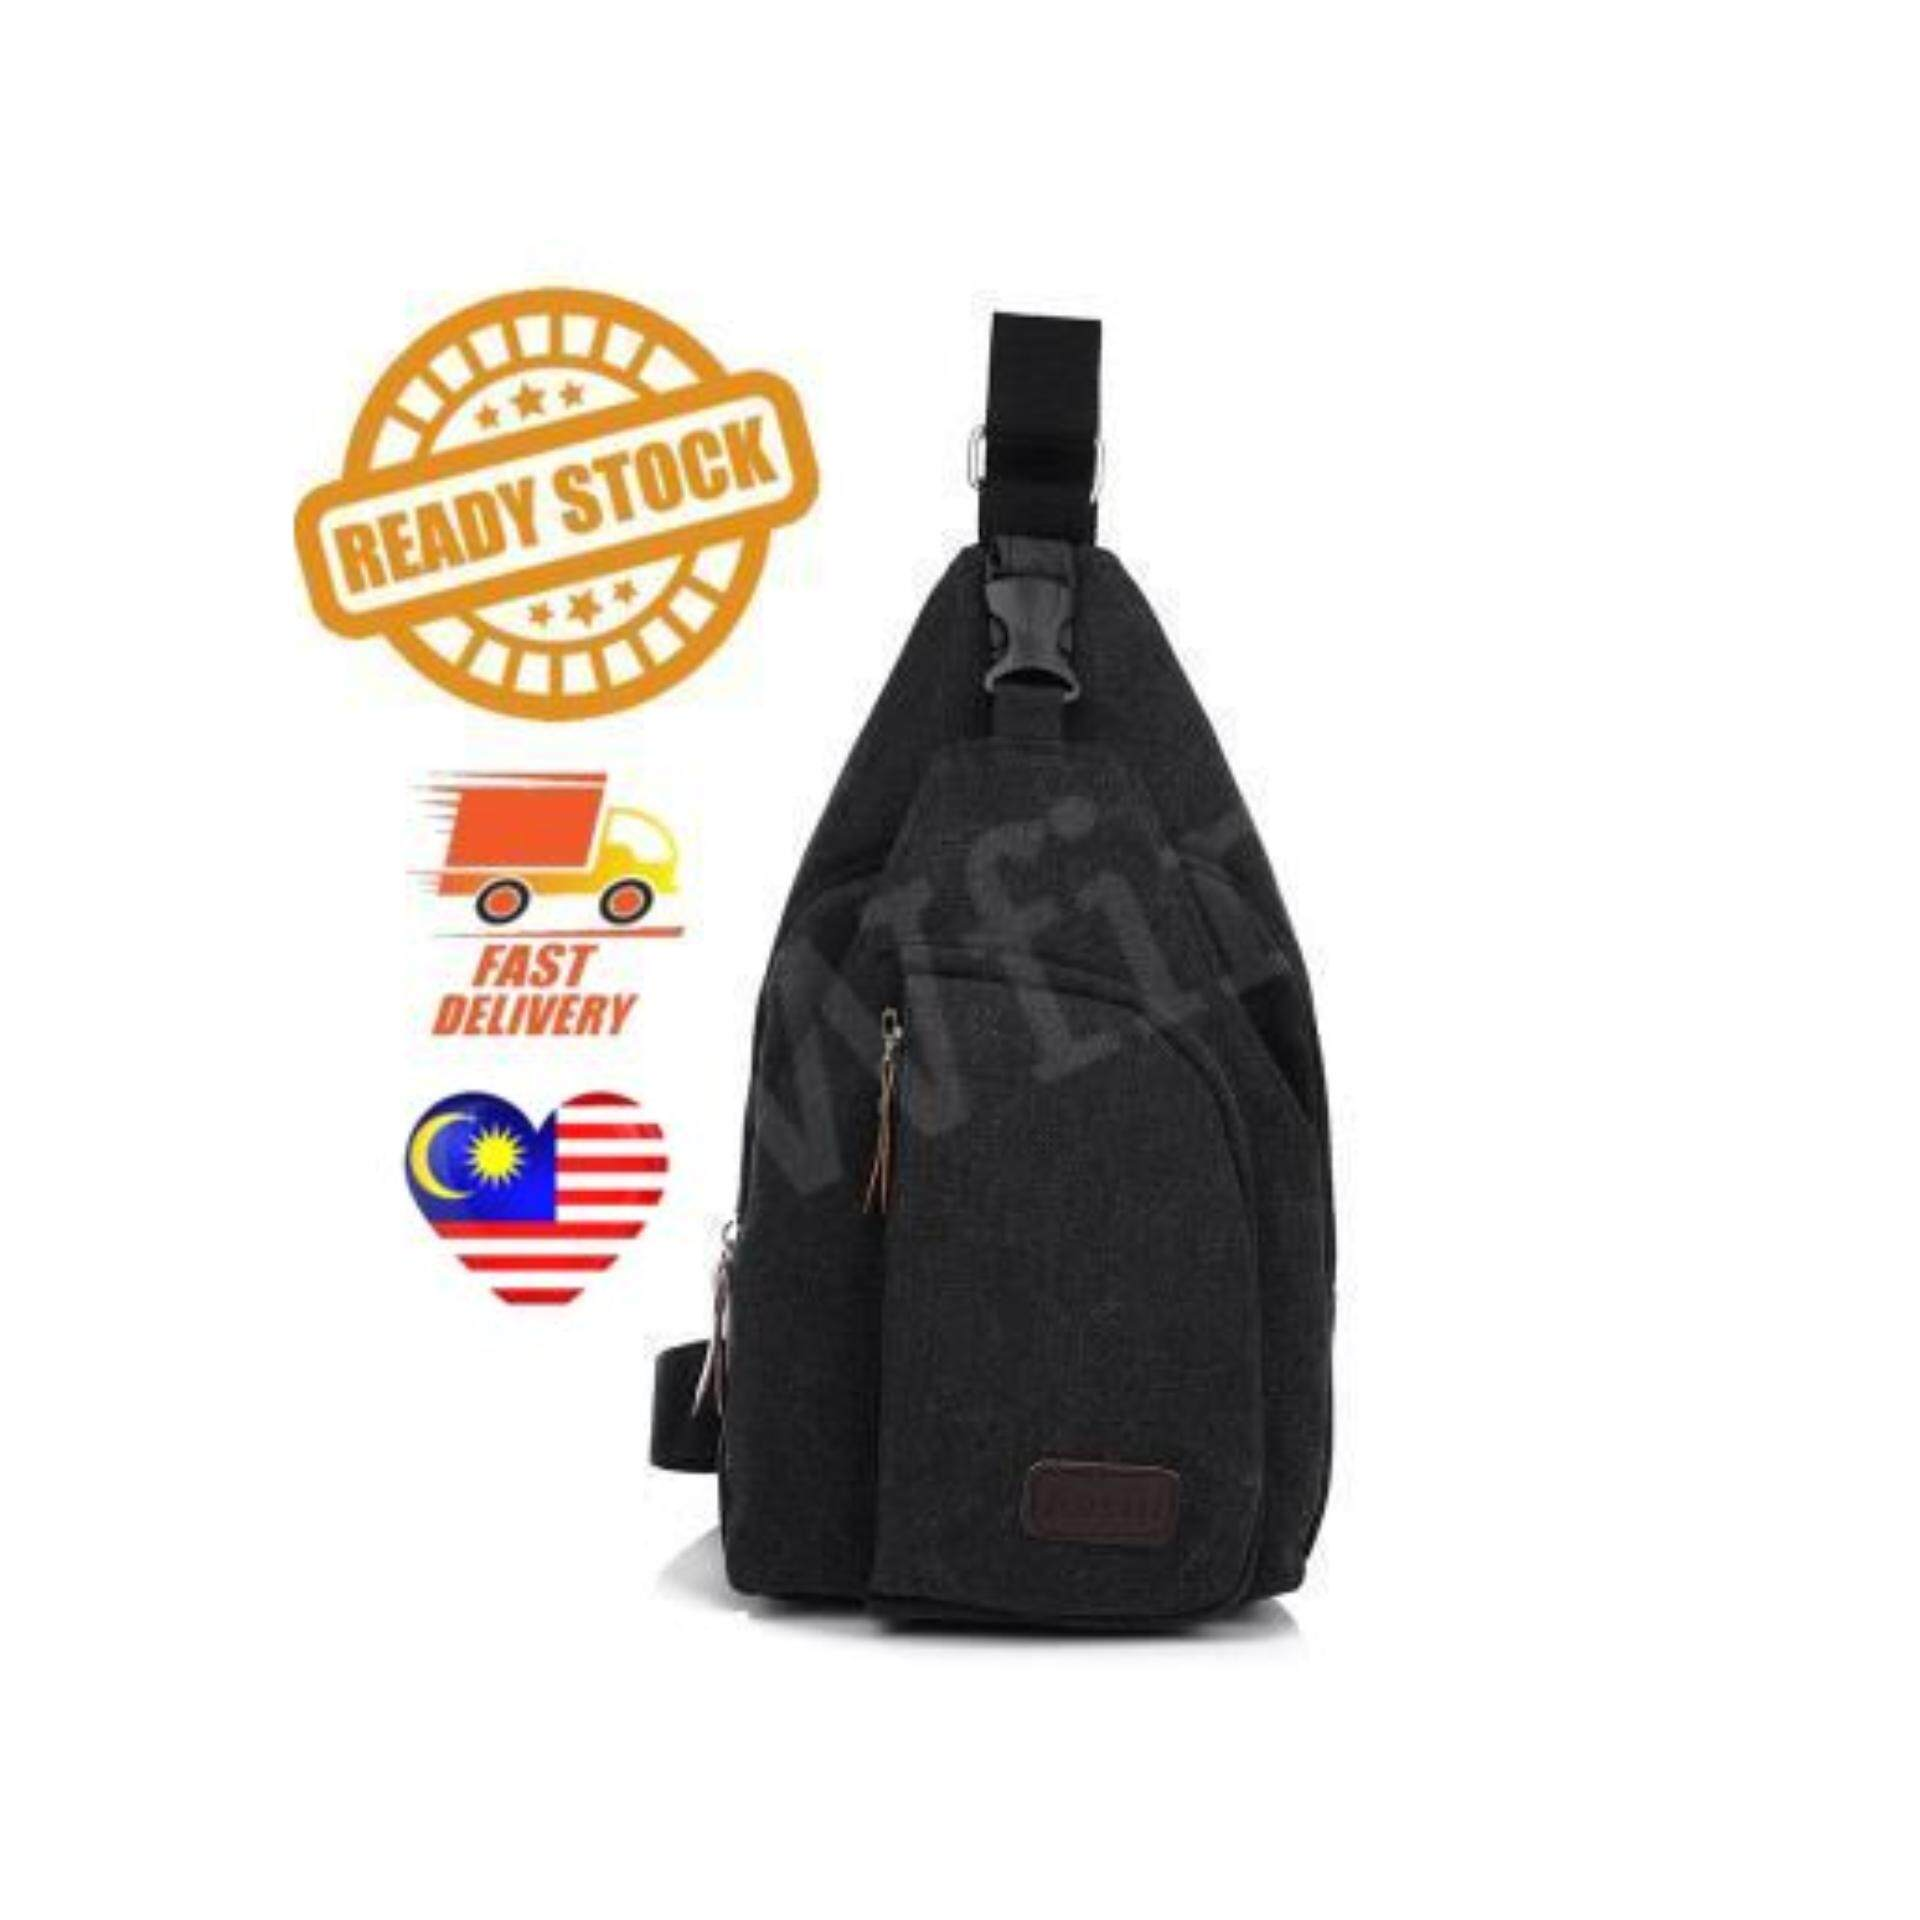 610c2db980 Men Crossbody Bags. 87103 items found in Crossbody Bags. BEST DEALMen s  Chest Canvas Sling bag casual bag